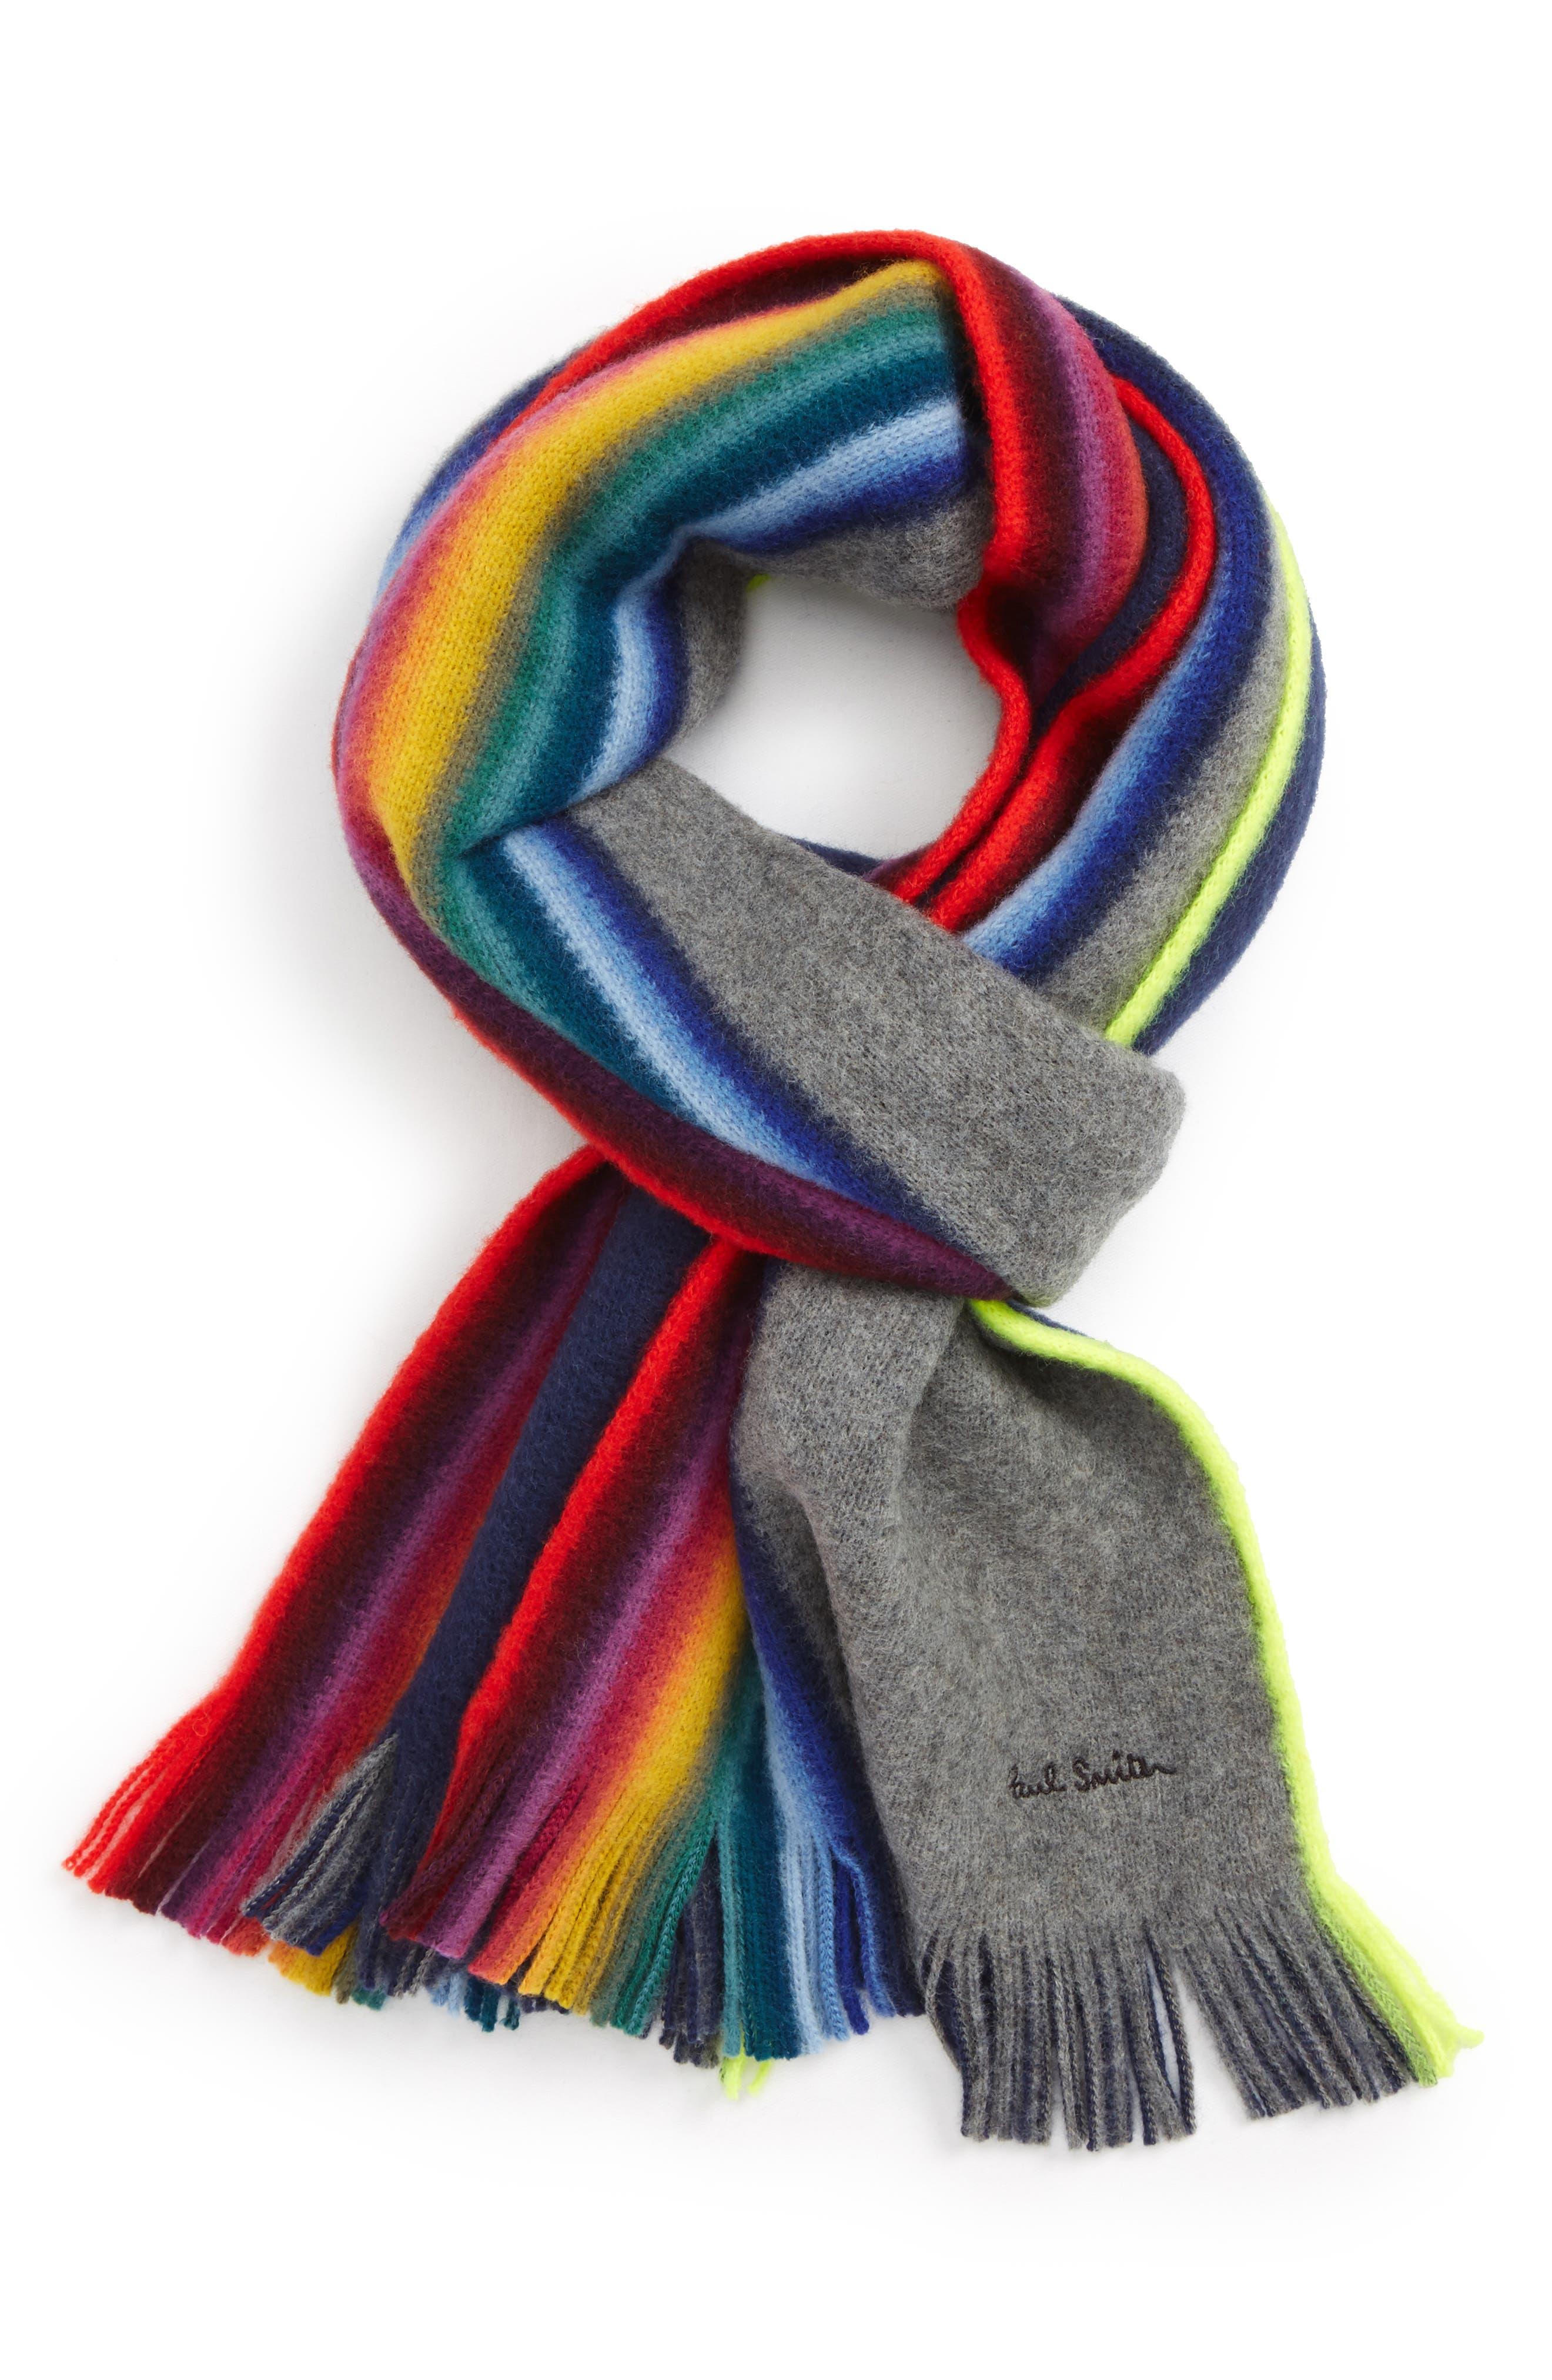 Main Image - Paul Smith Rainbow Edge Wool Scarf